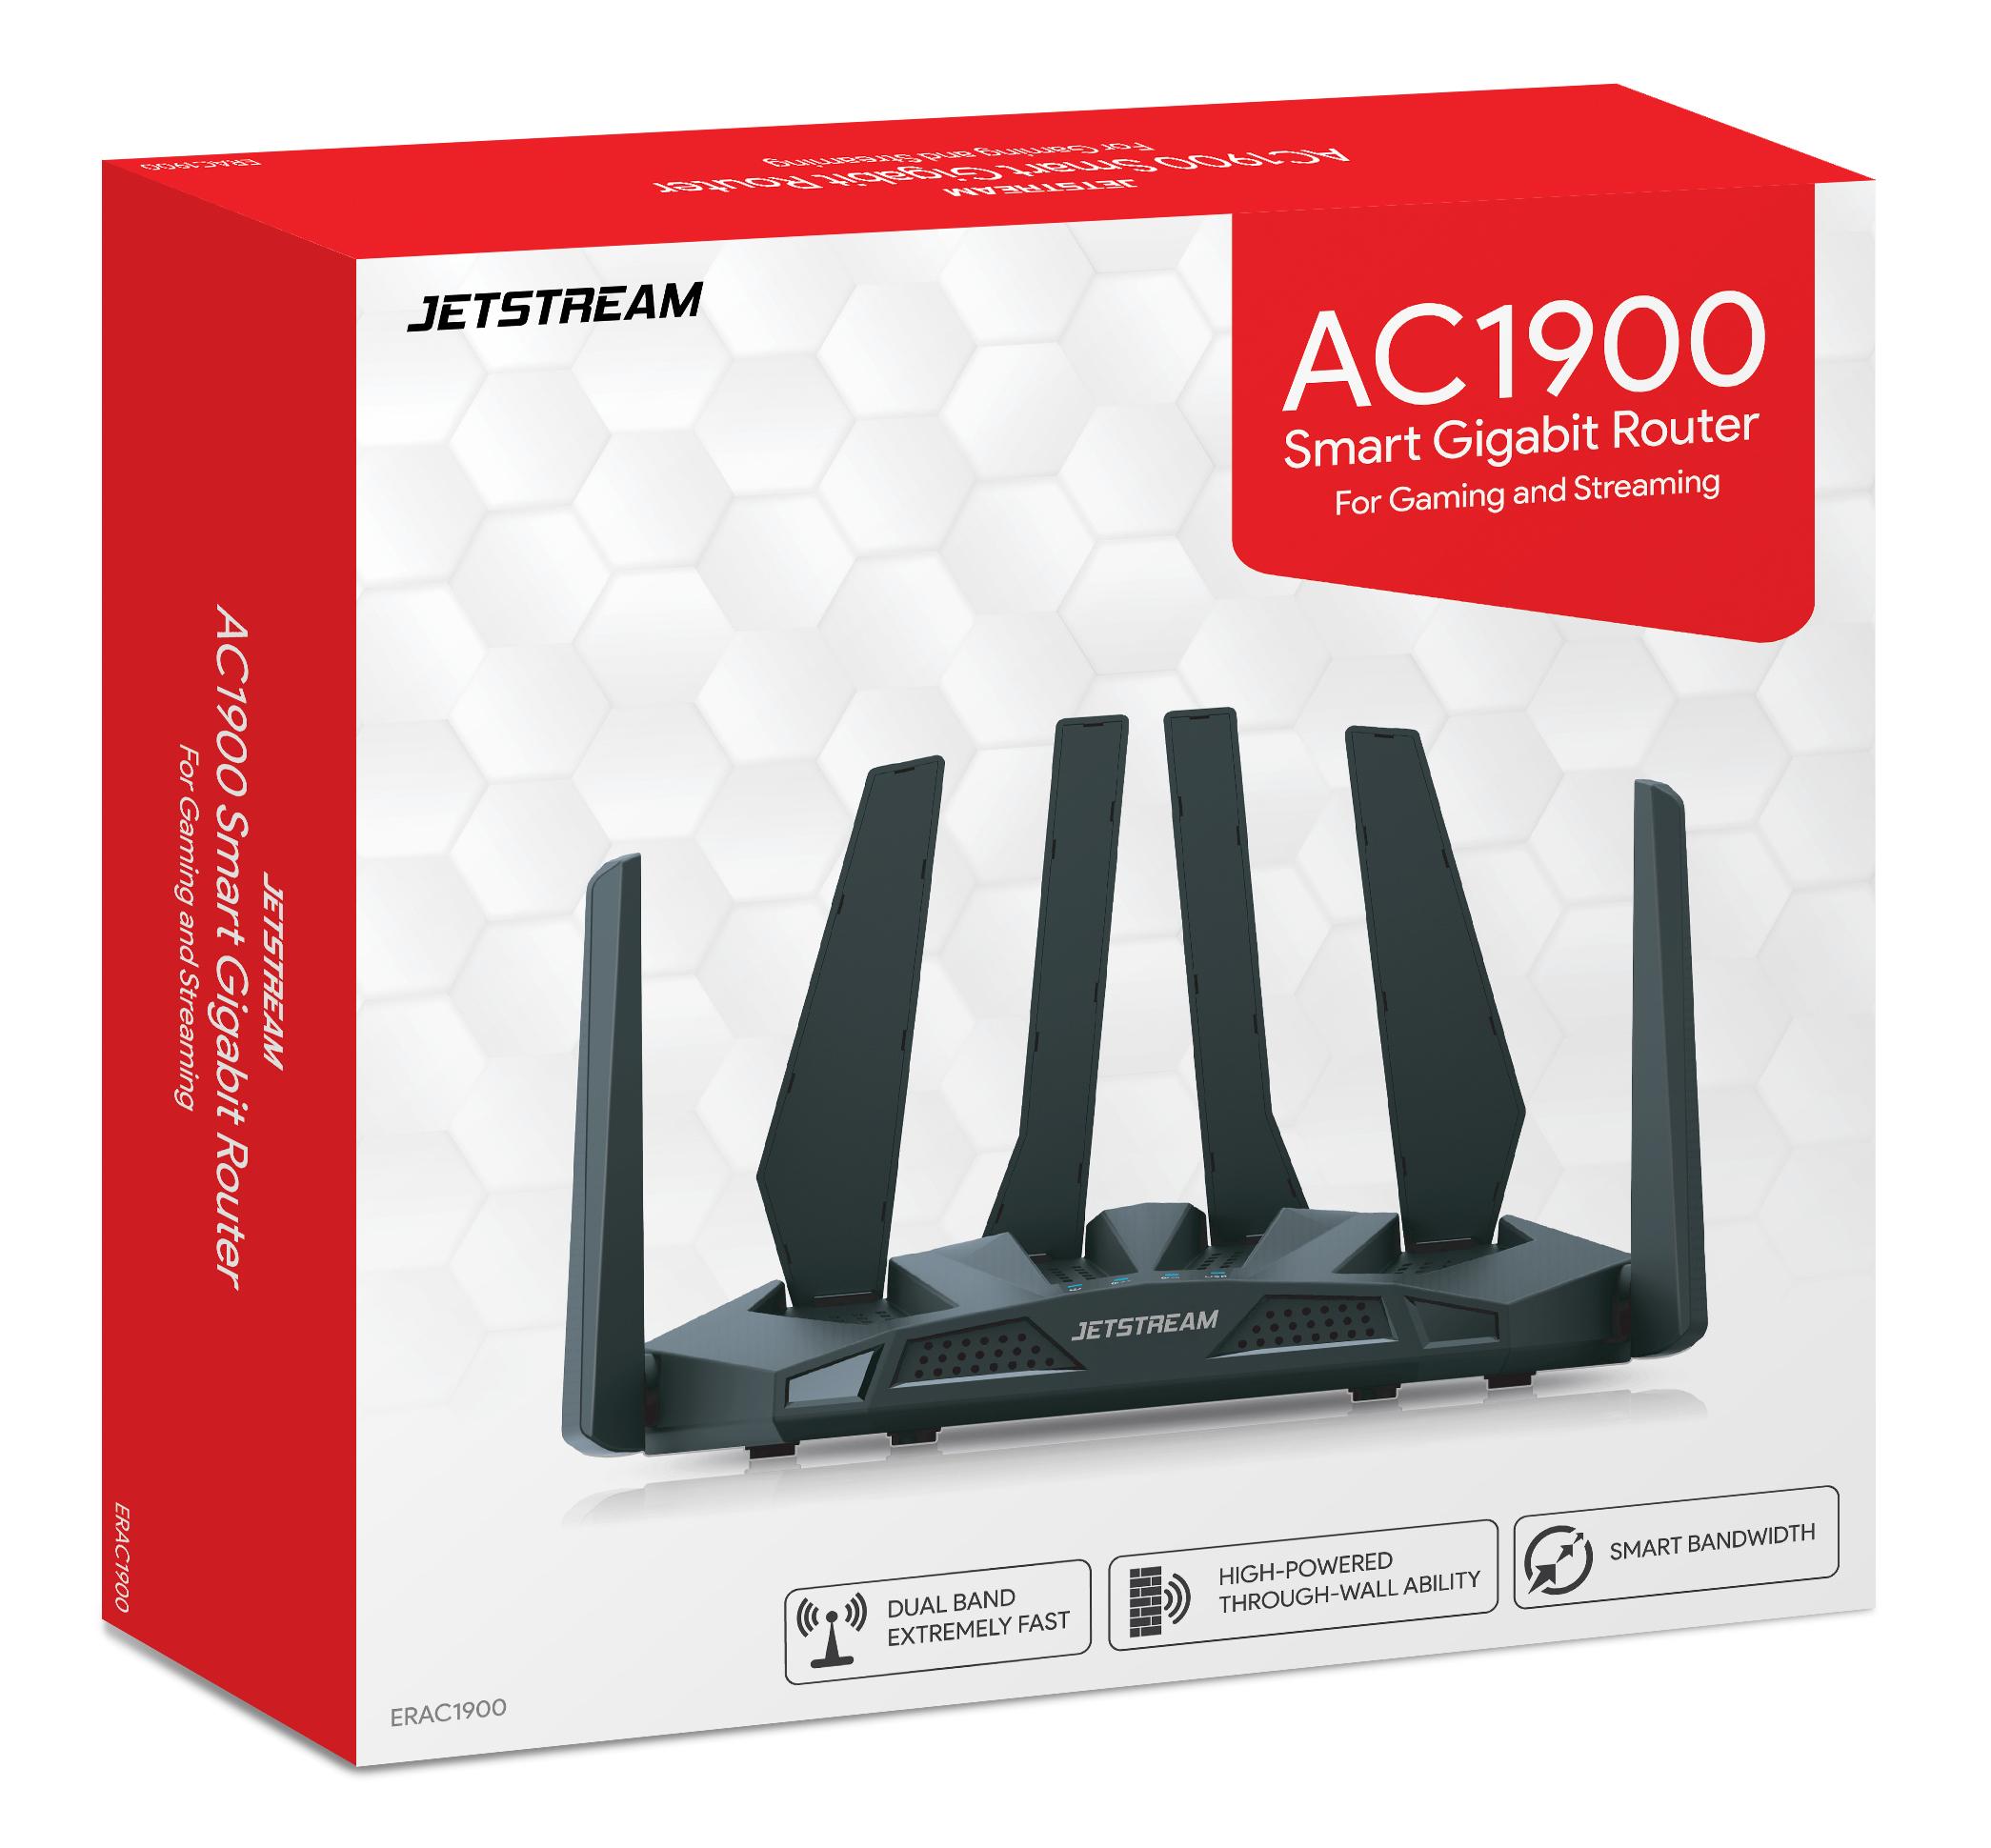 Jetstream AC1900 Dual Band WiFi Gaming Router, 801.11a/b/g/n/ac - Walmart Exclusive!